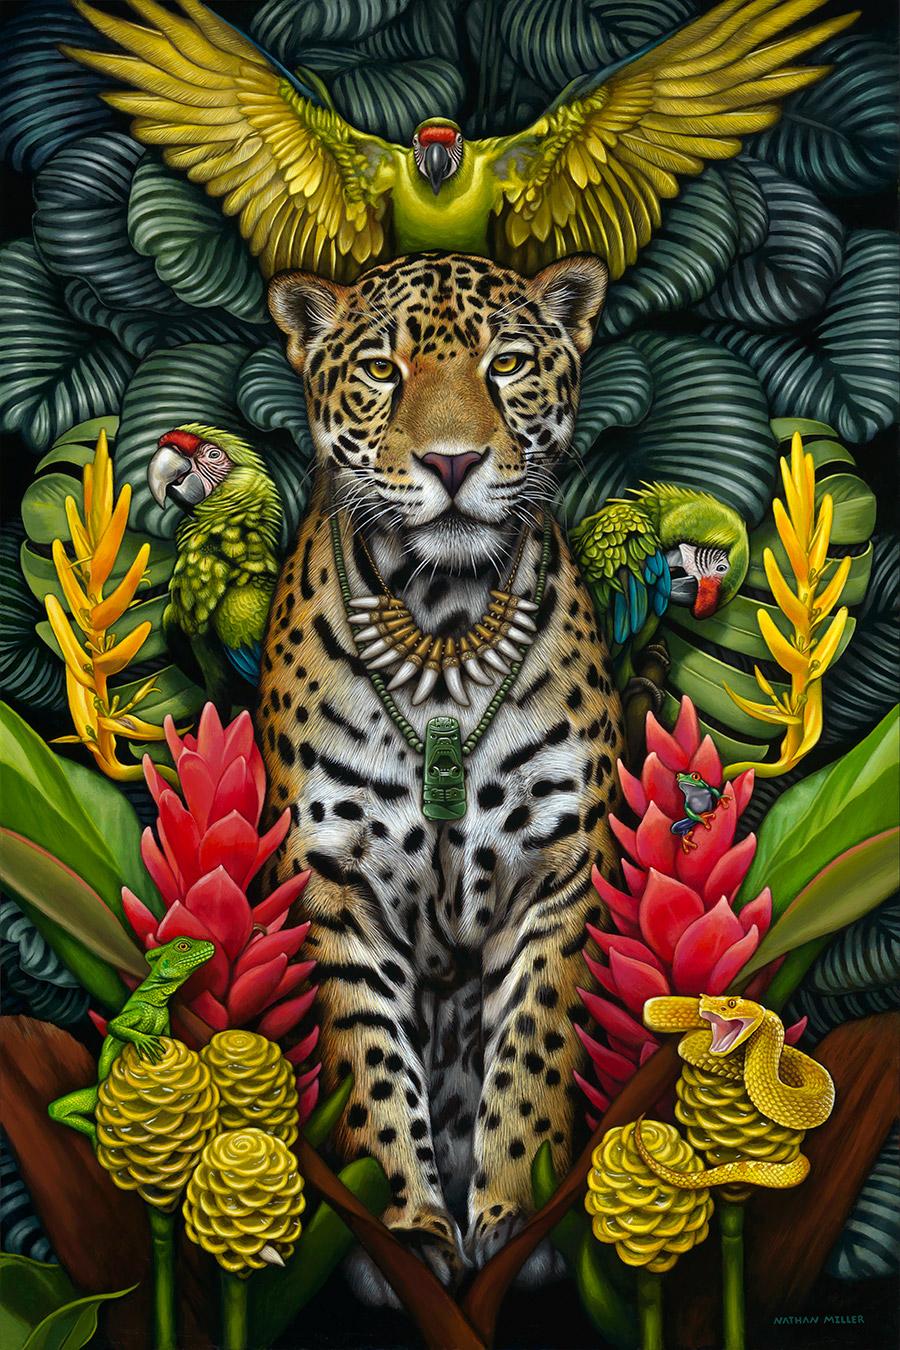 Legend of the Jaguar Shaman - Art by Nathan Miller